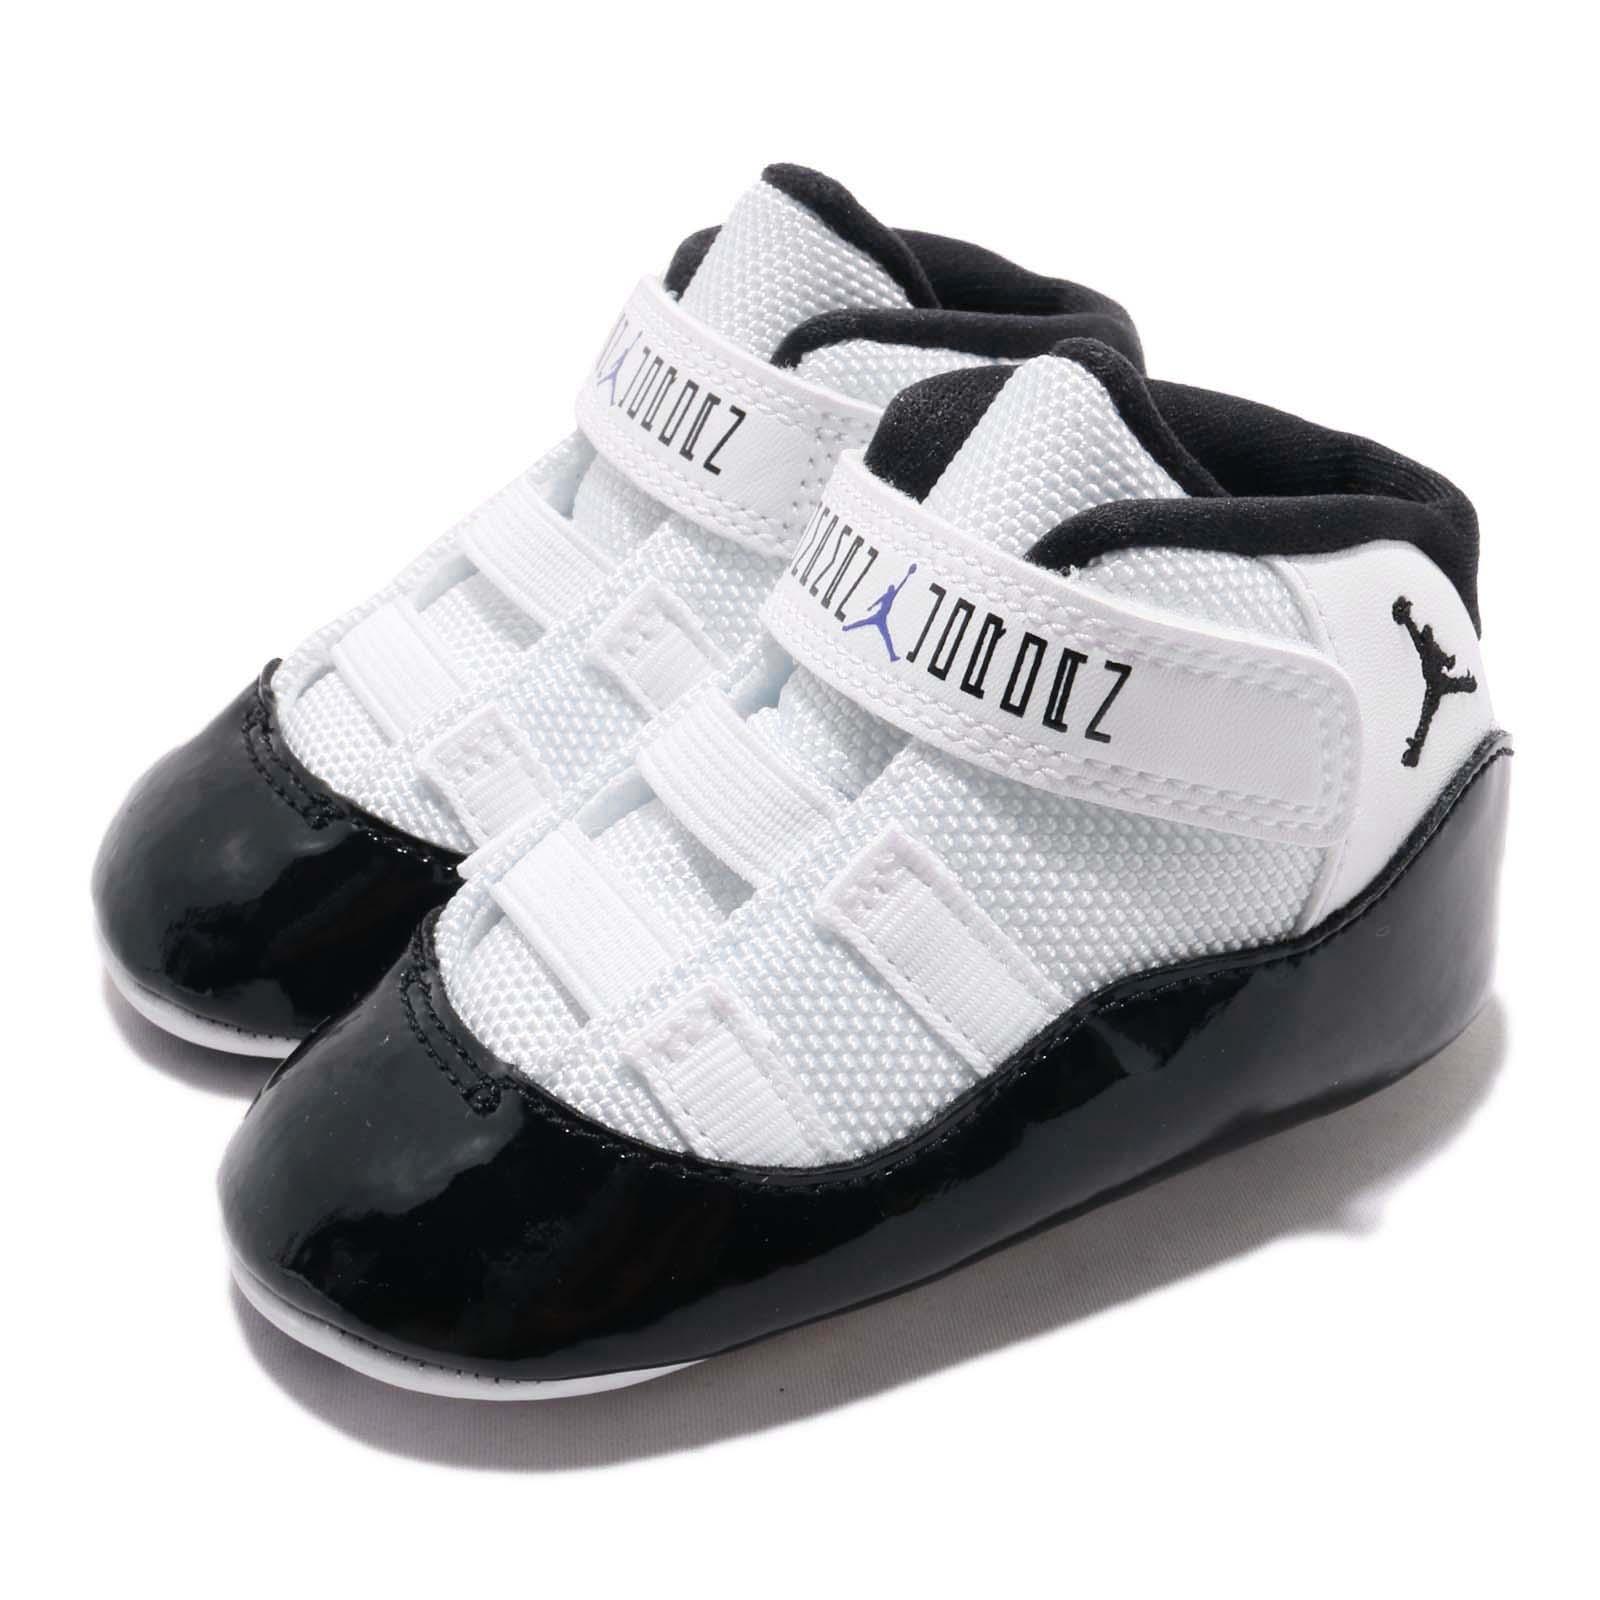 Nike 學步鞋 Jordan 11 Retro 童鞋 378049-100